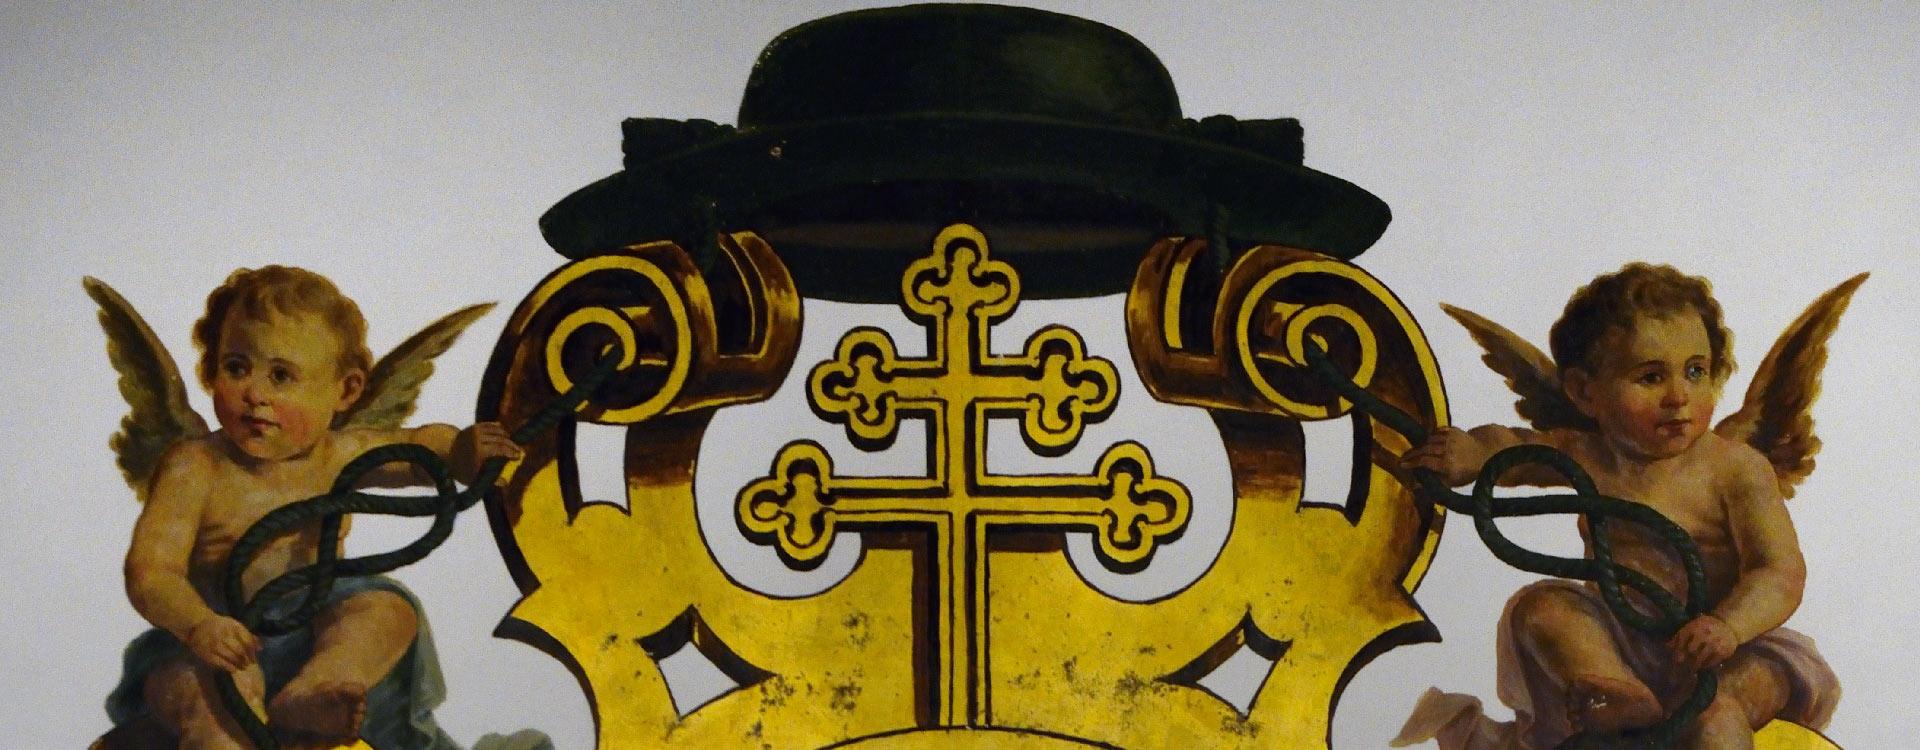 patriarca-cabecera-1